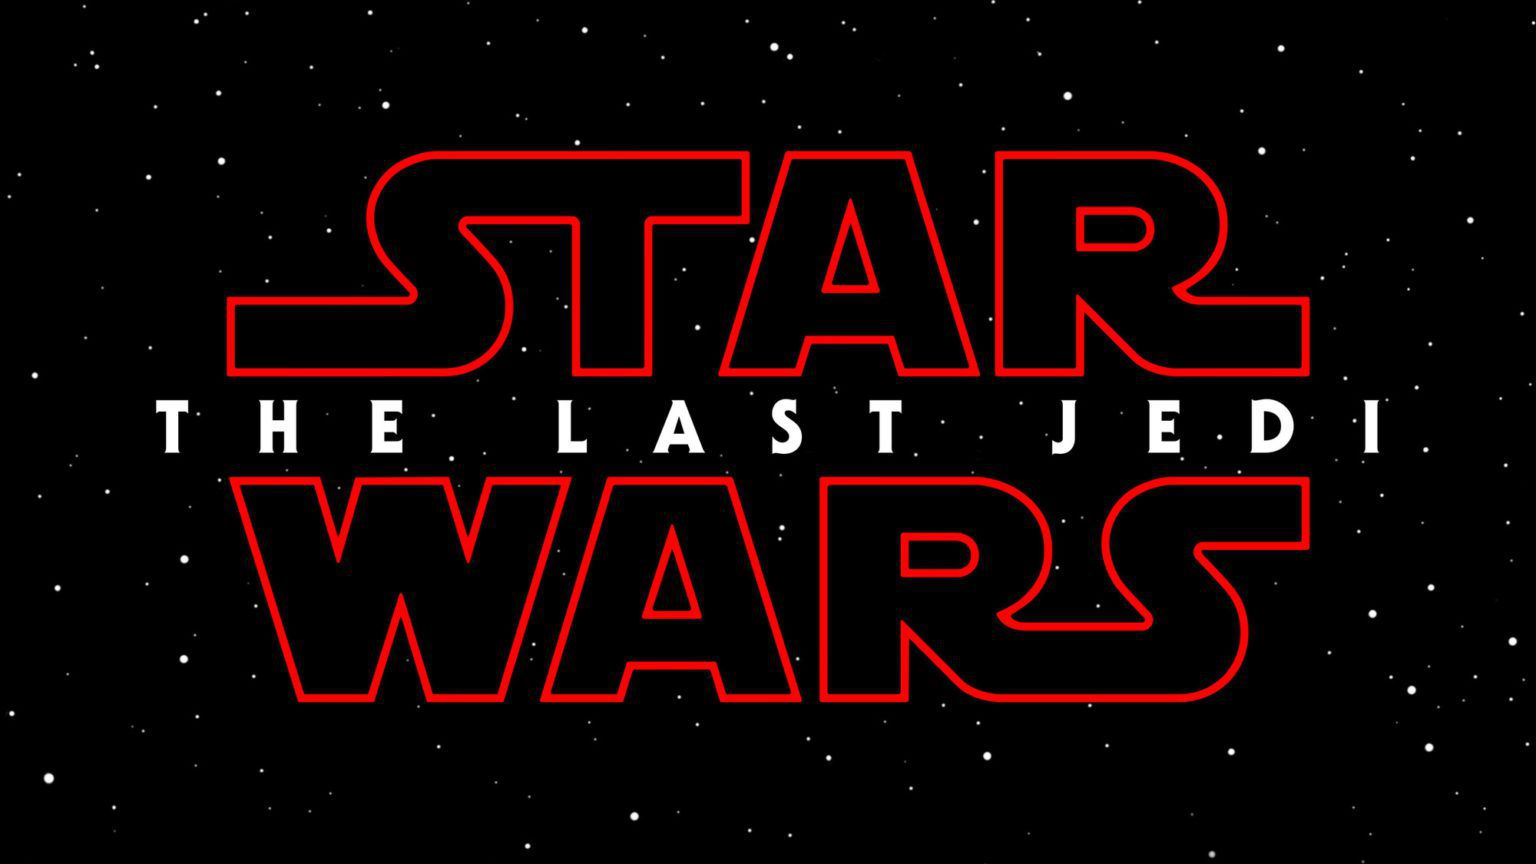 star-wars-the-last-jedi-disney-episode-viii (1)